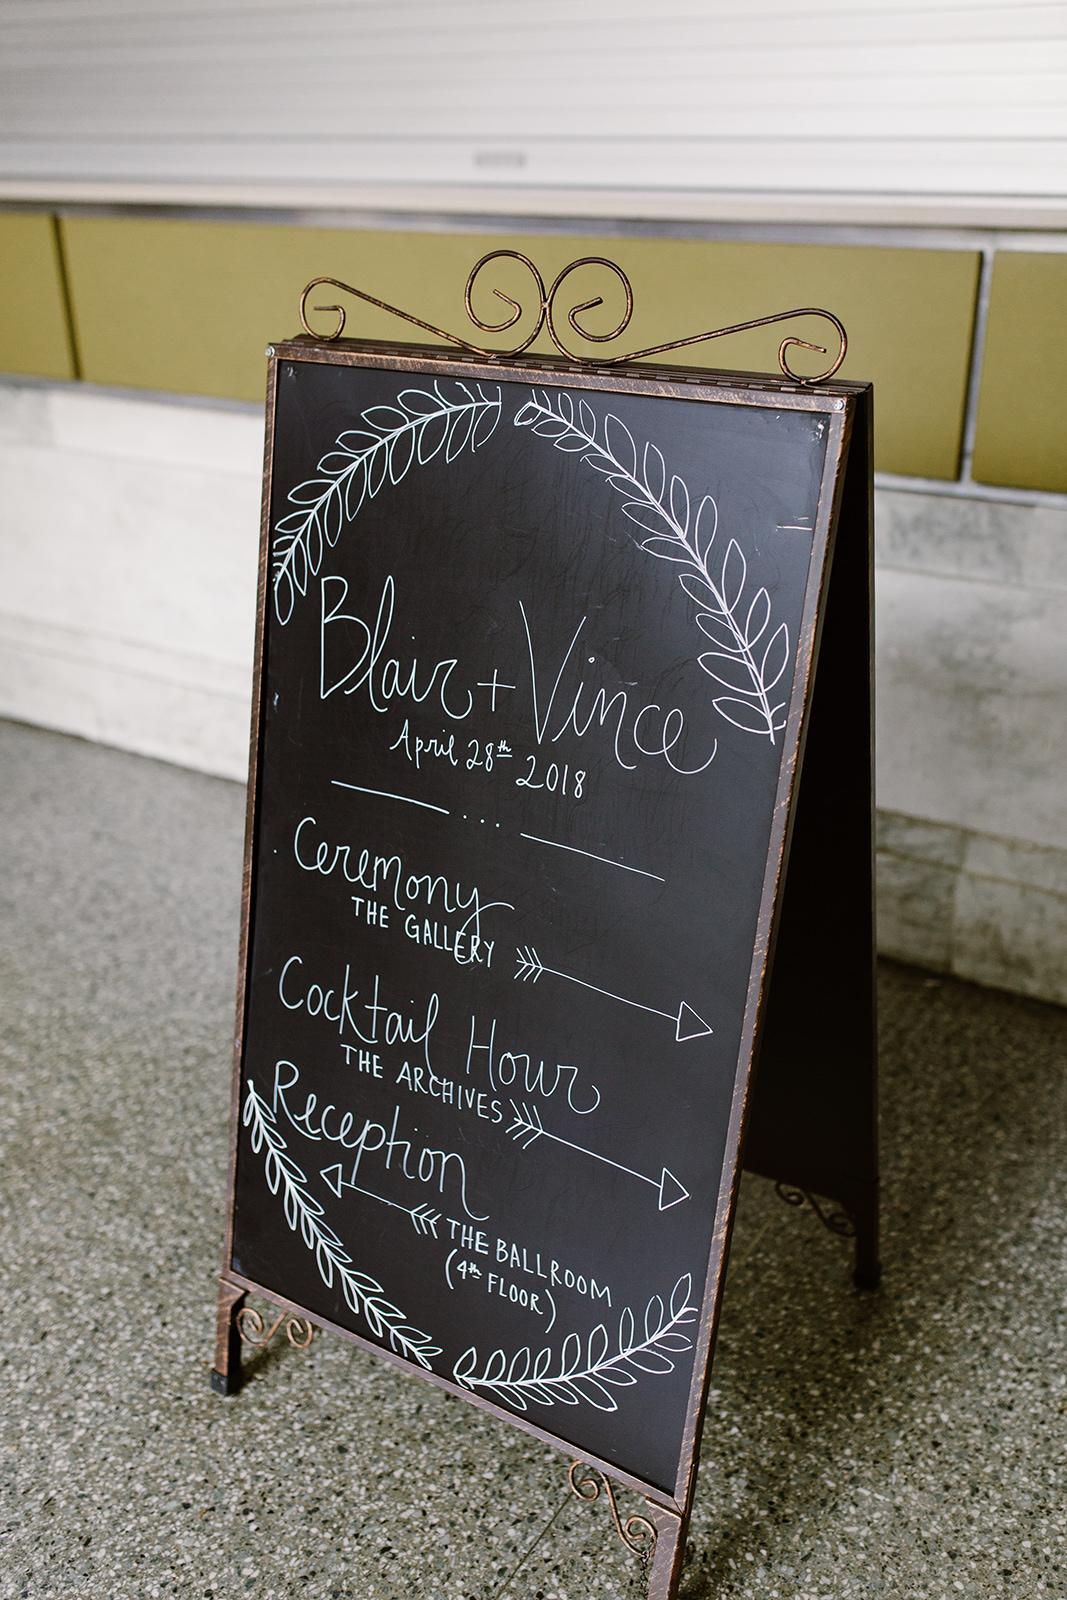 Blair_Vince-Ceremony-235.jpg